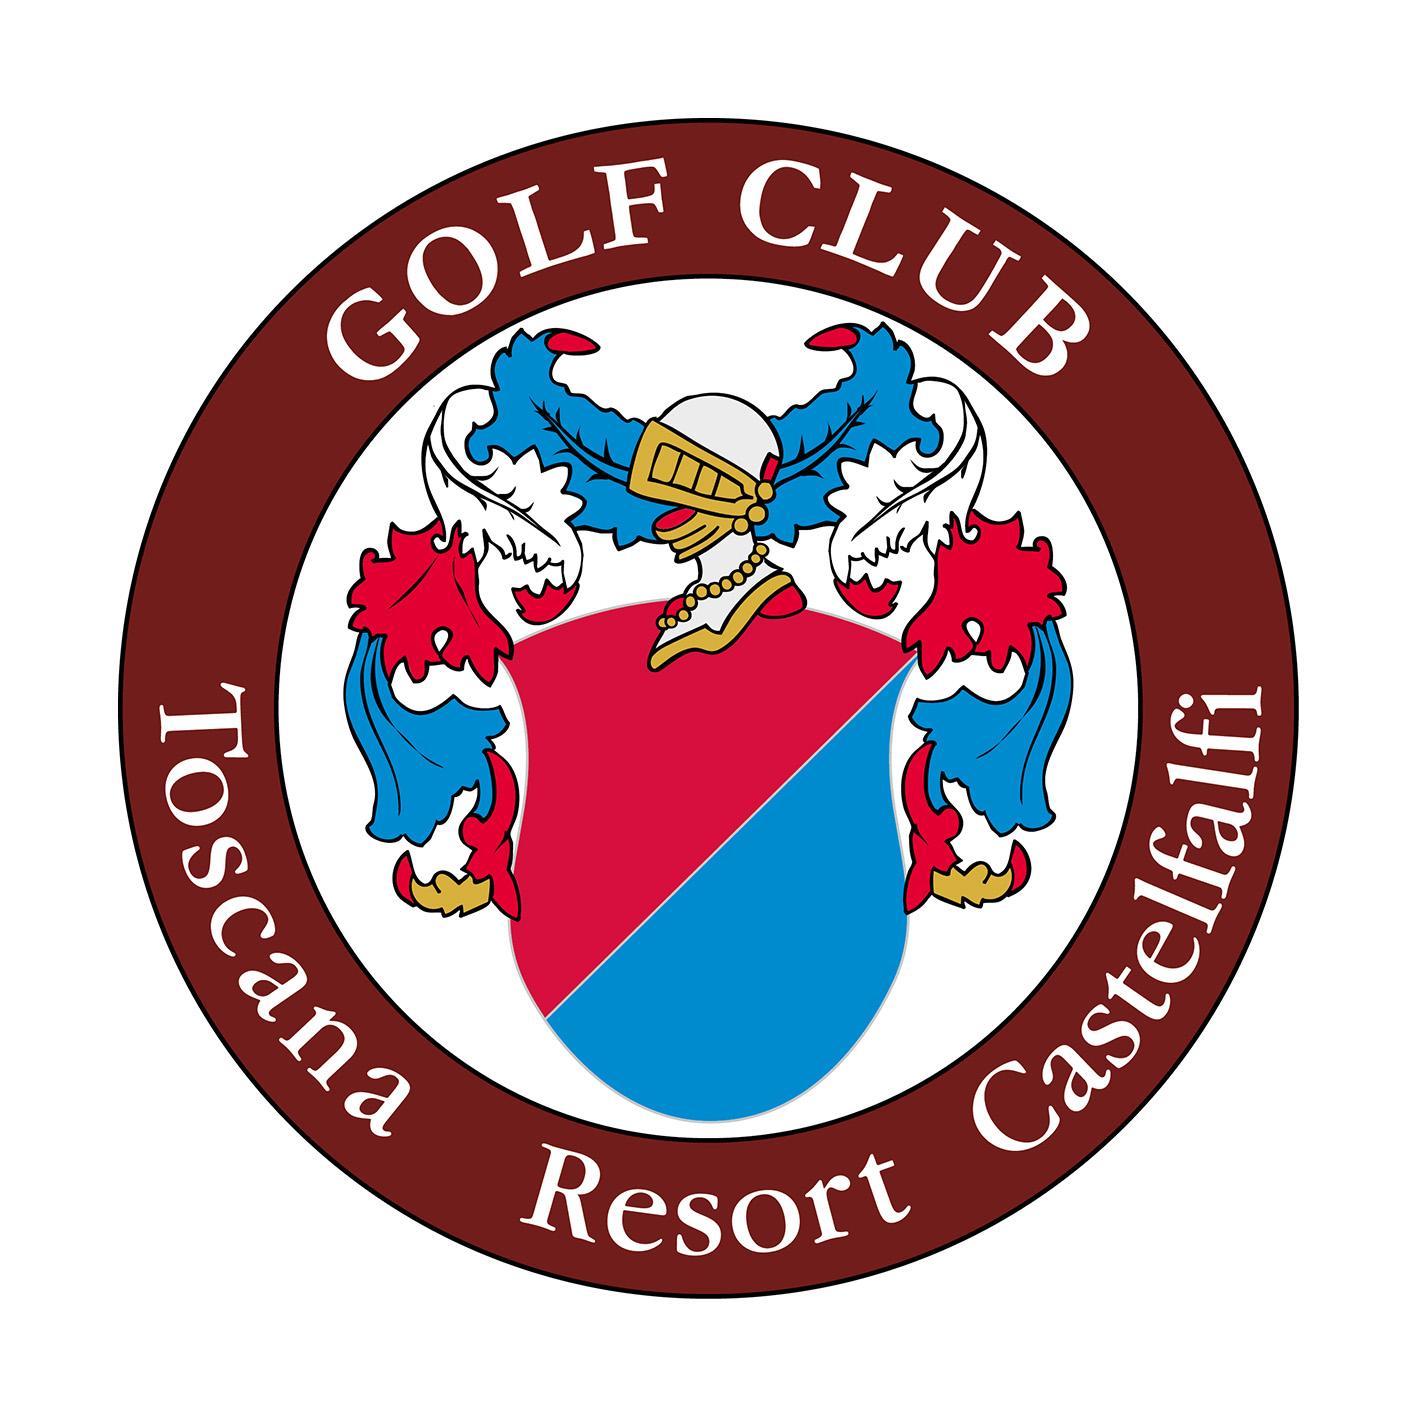 Logo of golf course named Castelfalfi Golf Club